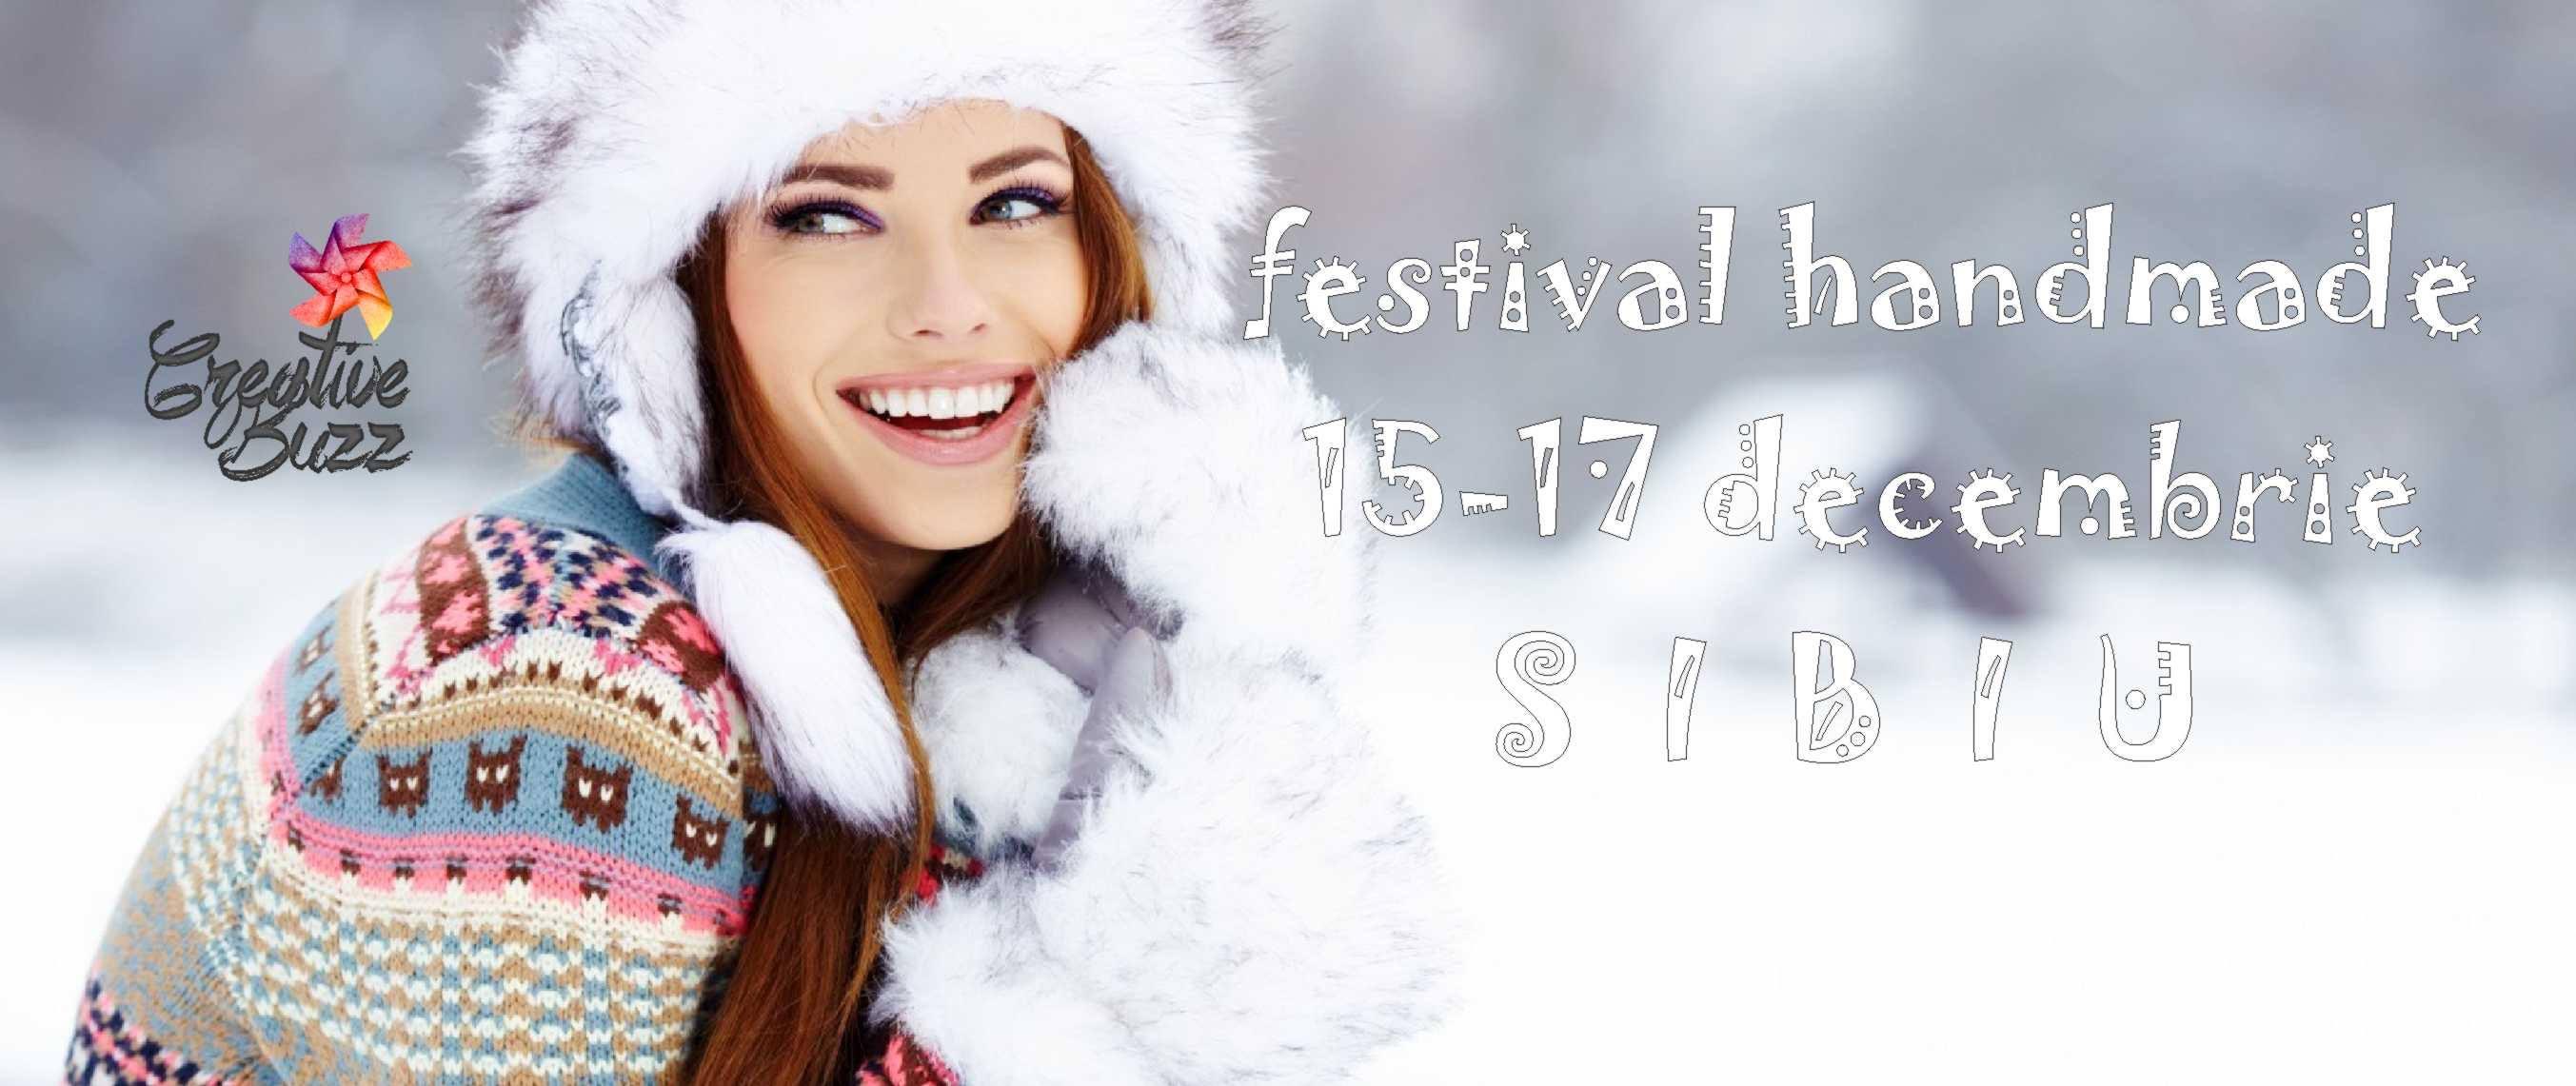 Festival Handmade Creative Buzz la Sibiu - ediția 15